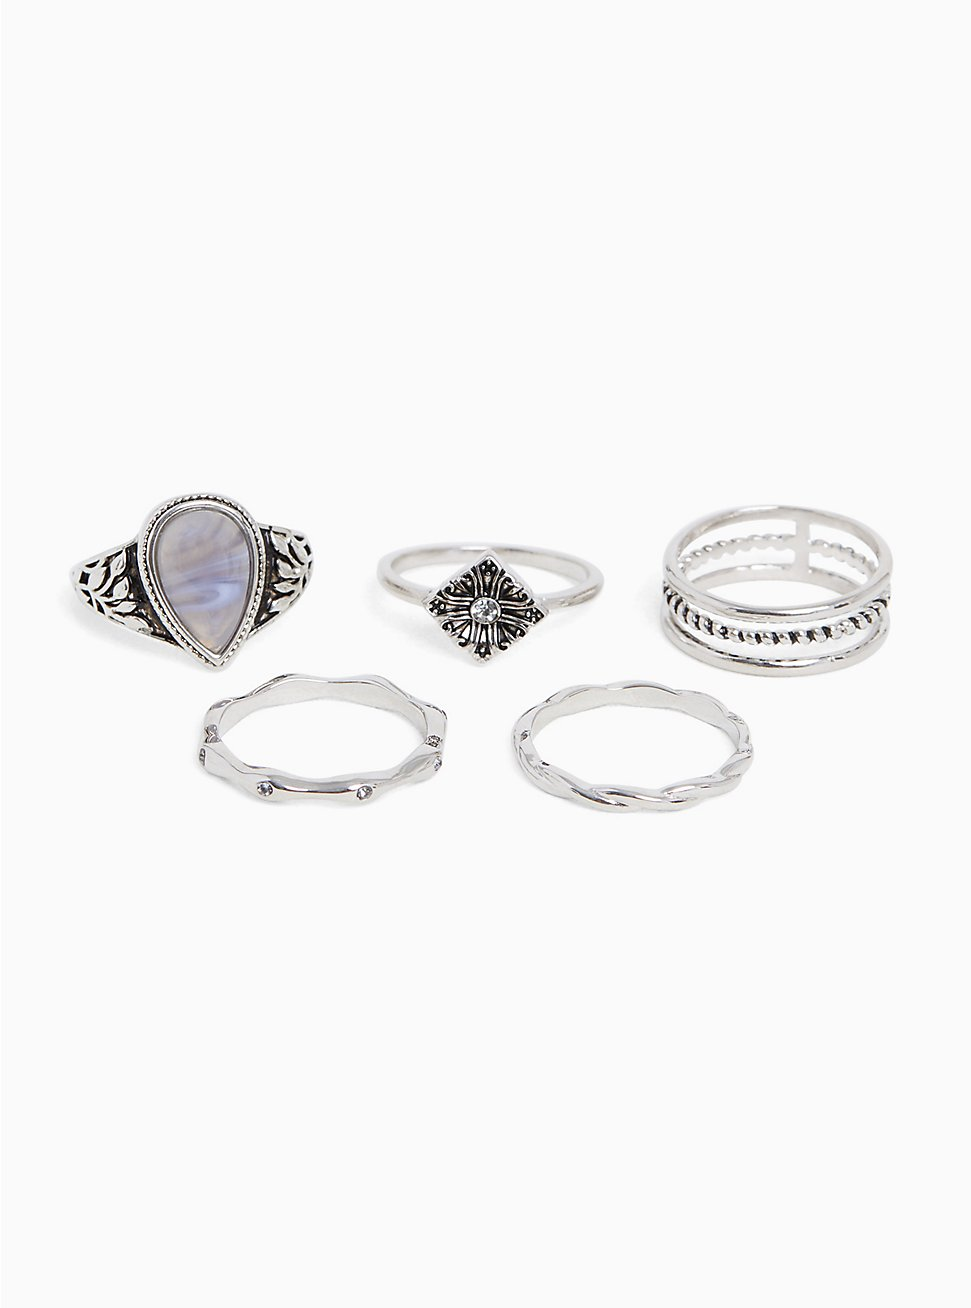 Silver-Tone Teardrop Faux Stone Ring Set - Set of 5, , hi-res